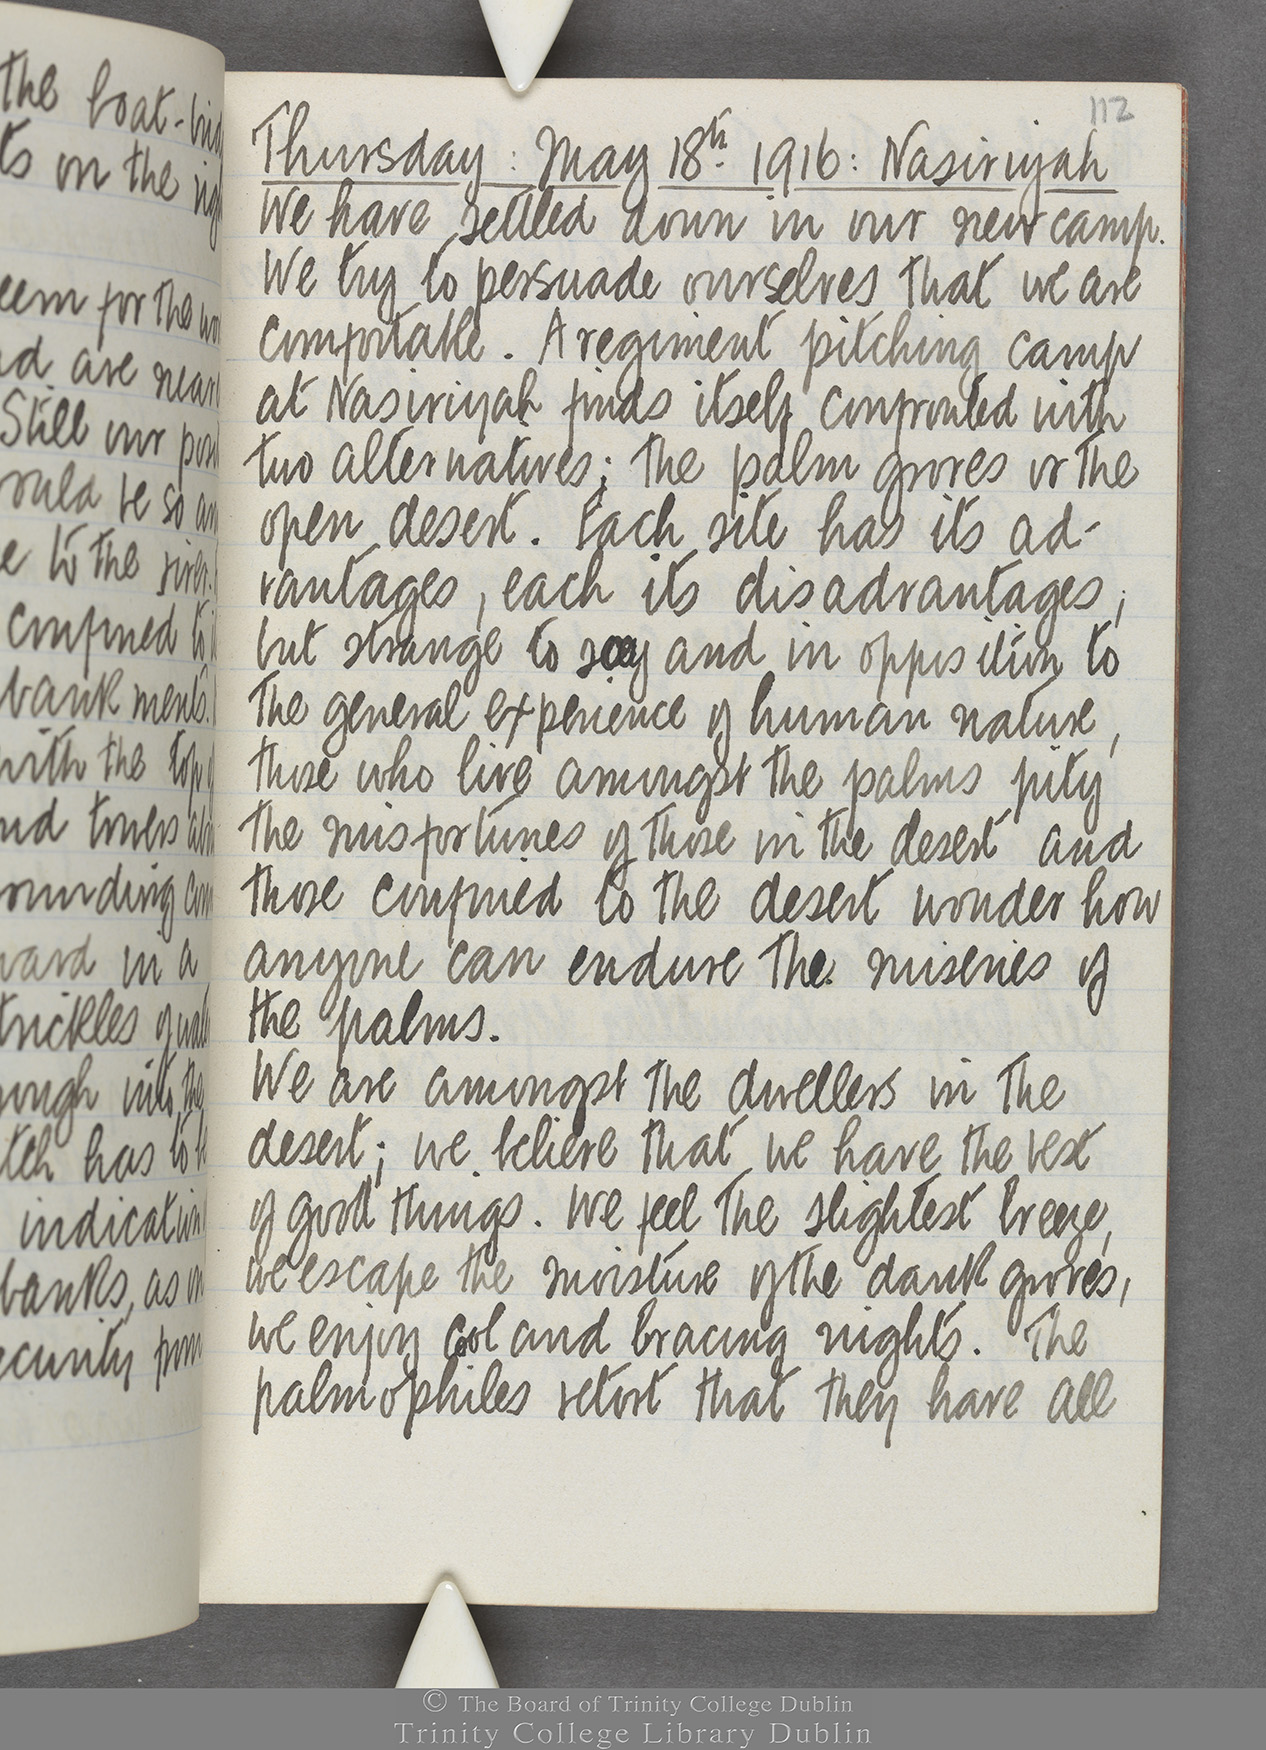 TCD MS 10515 folio 112 recto